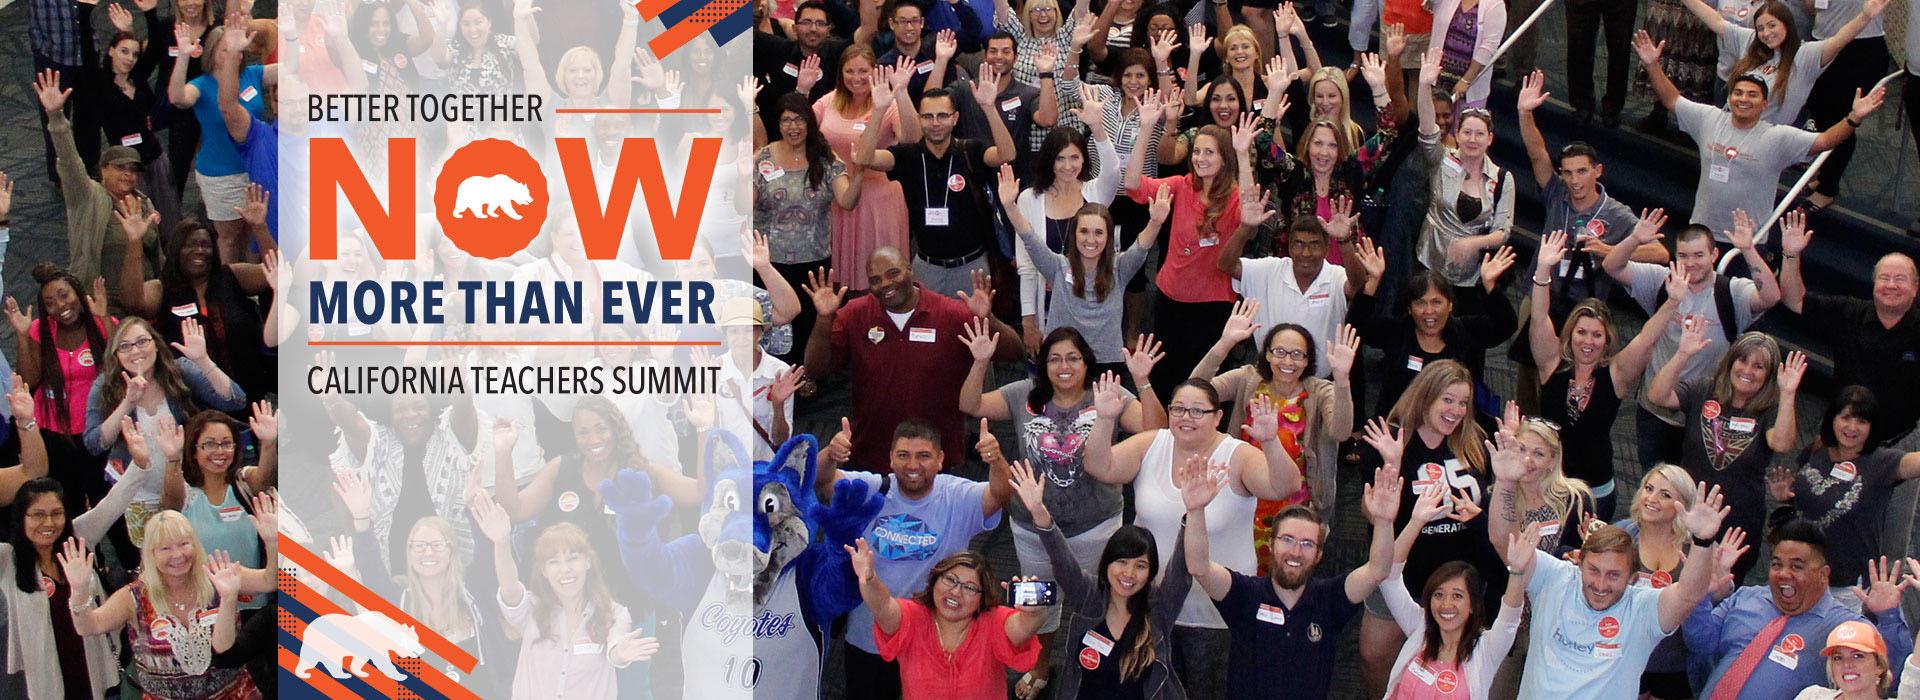 Jill Biden to keynote Third Annual Better Together: California Teachers Summit